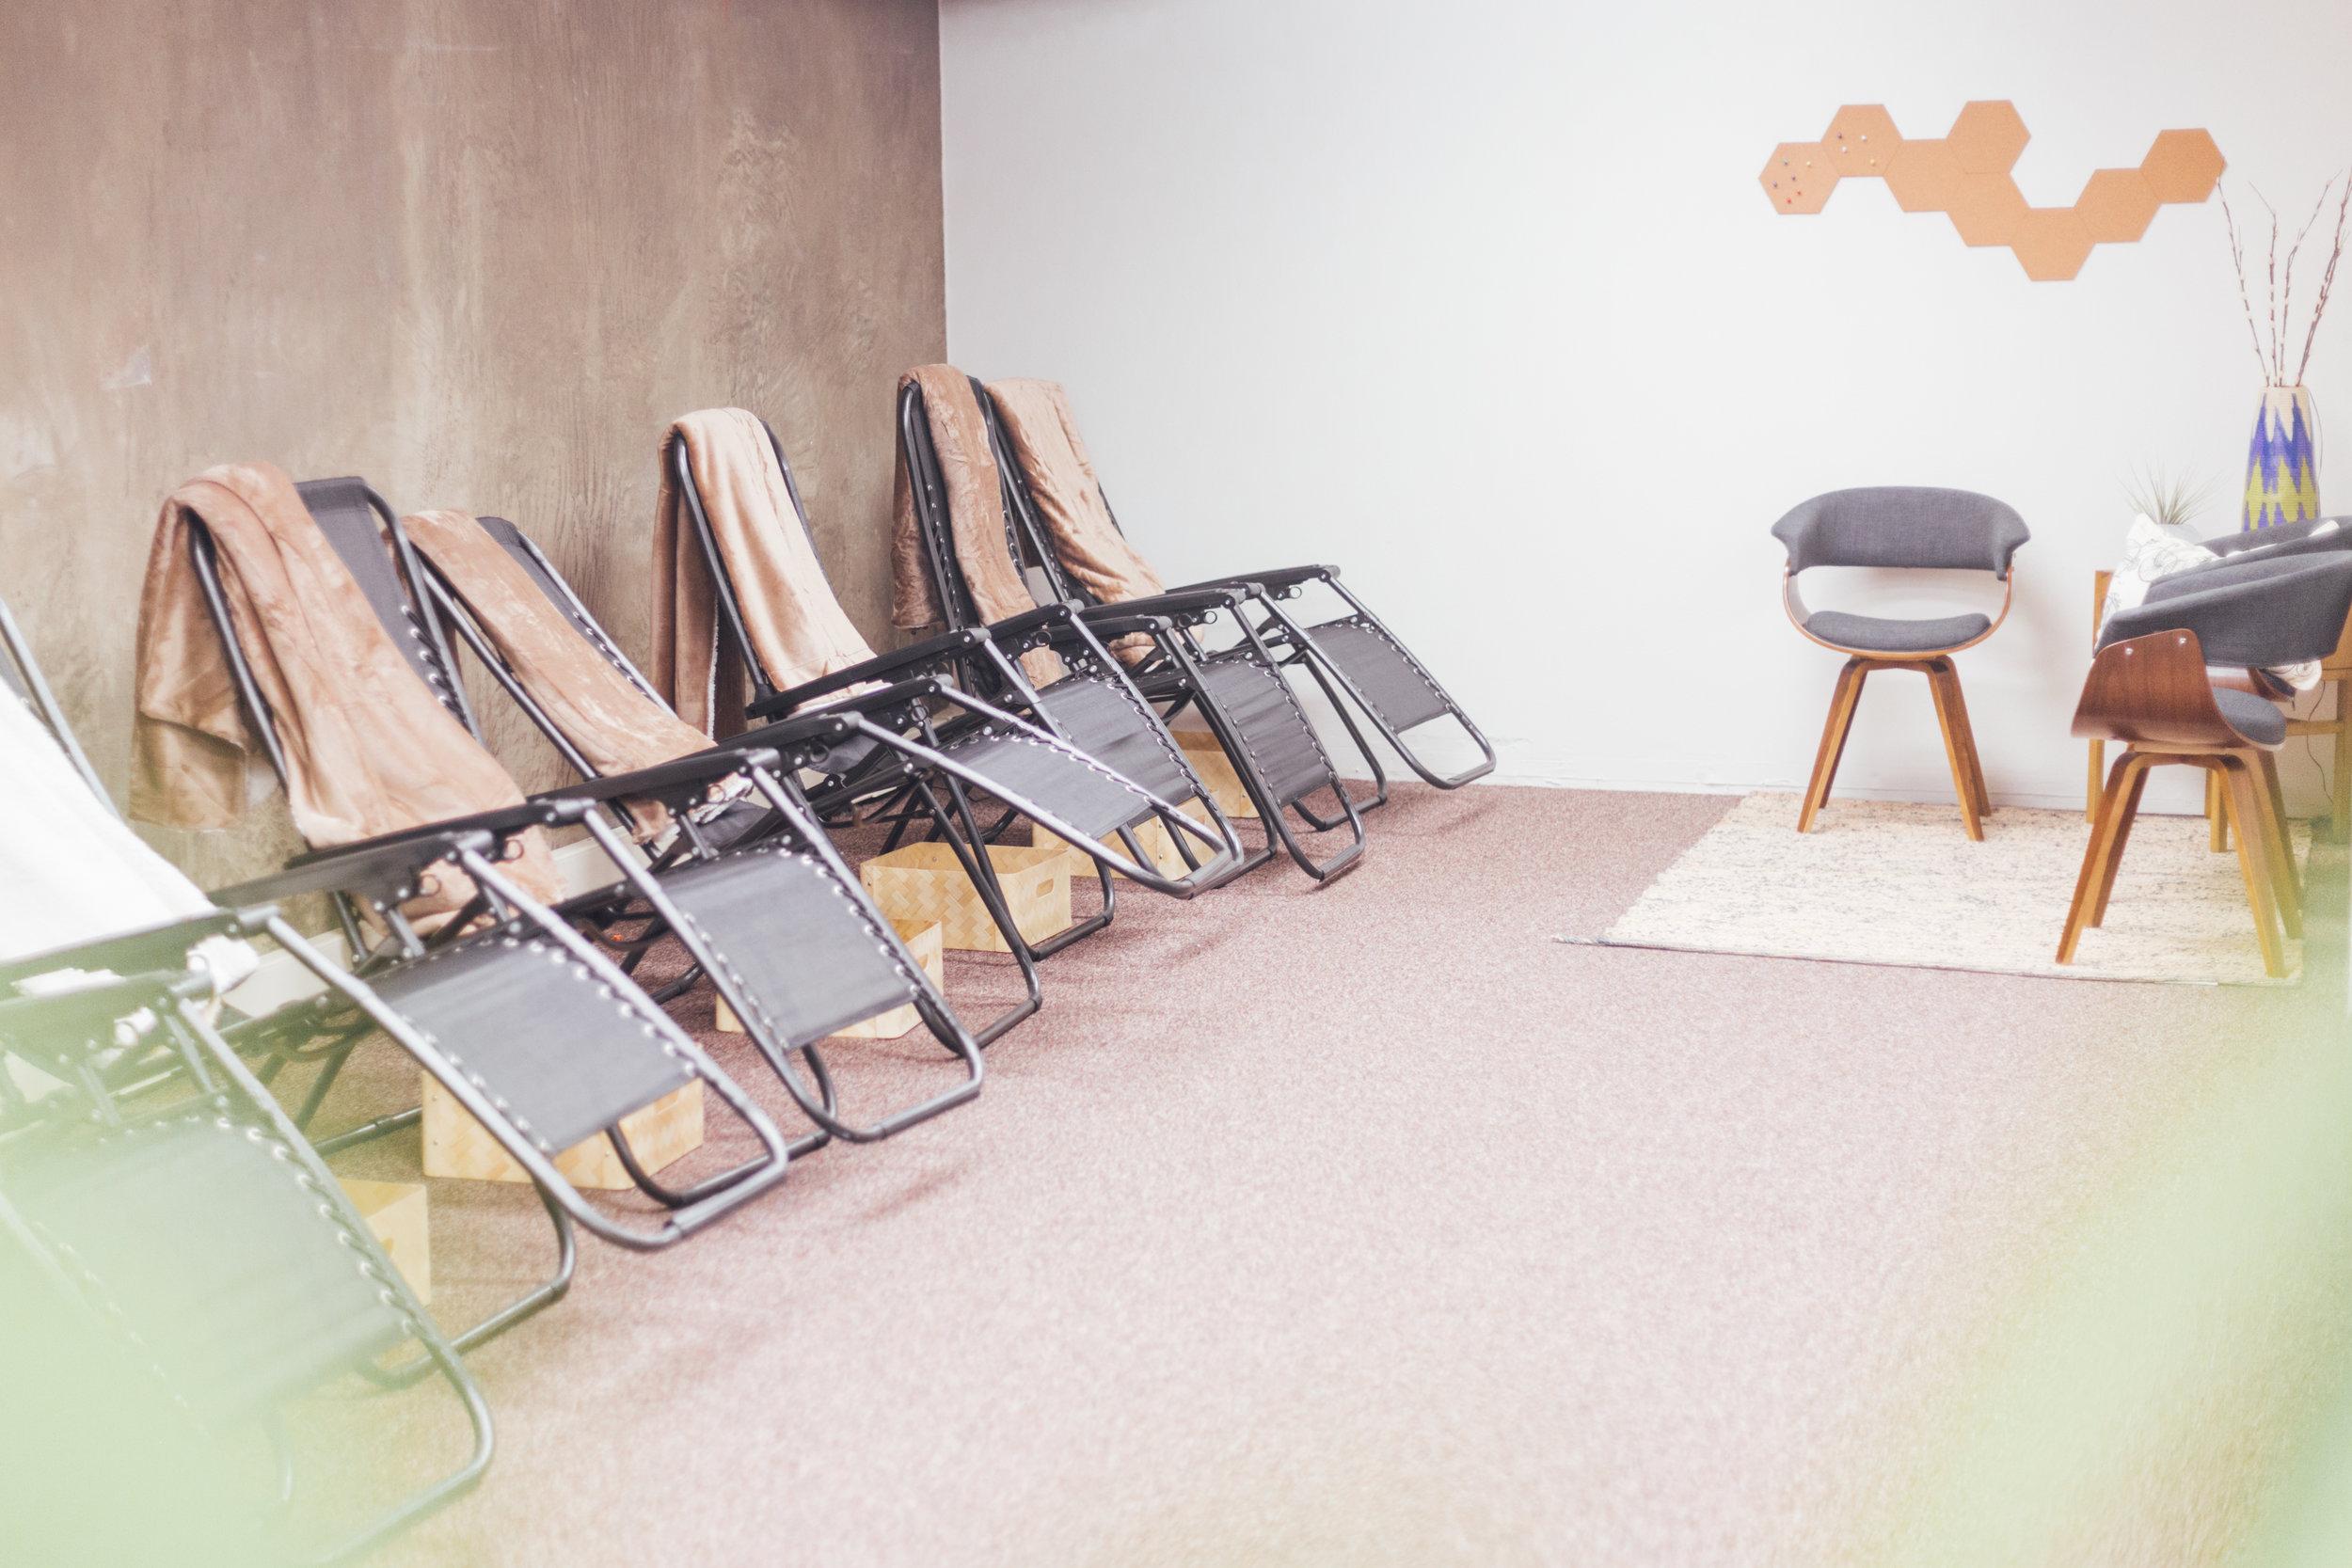 SLO Community Acupuncture